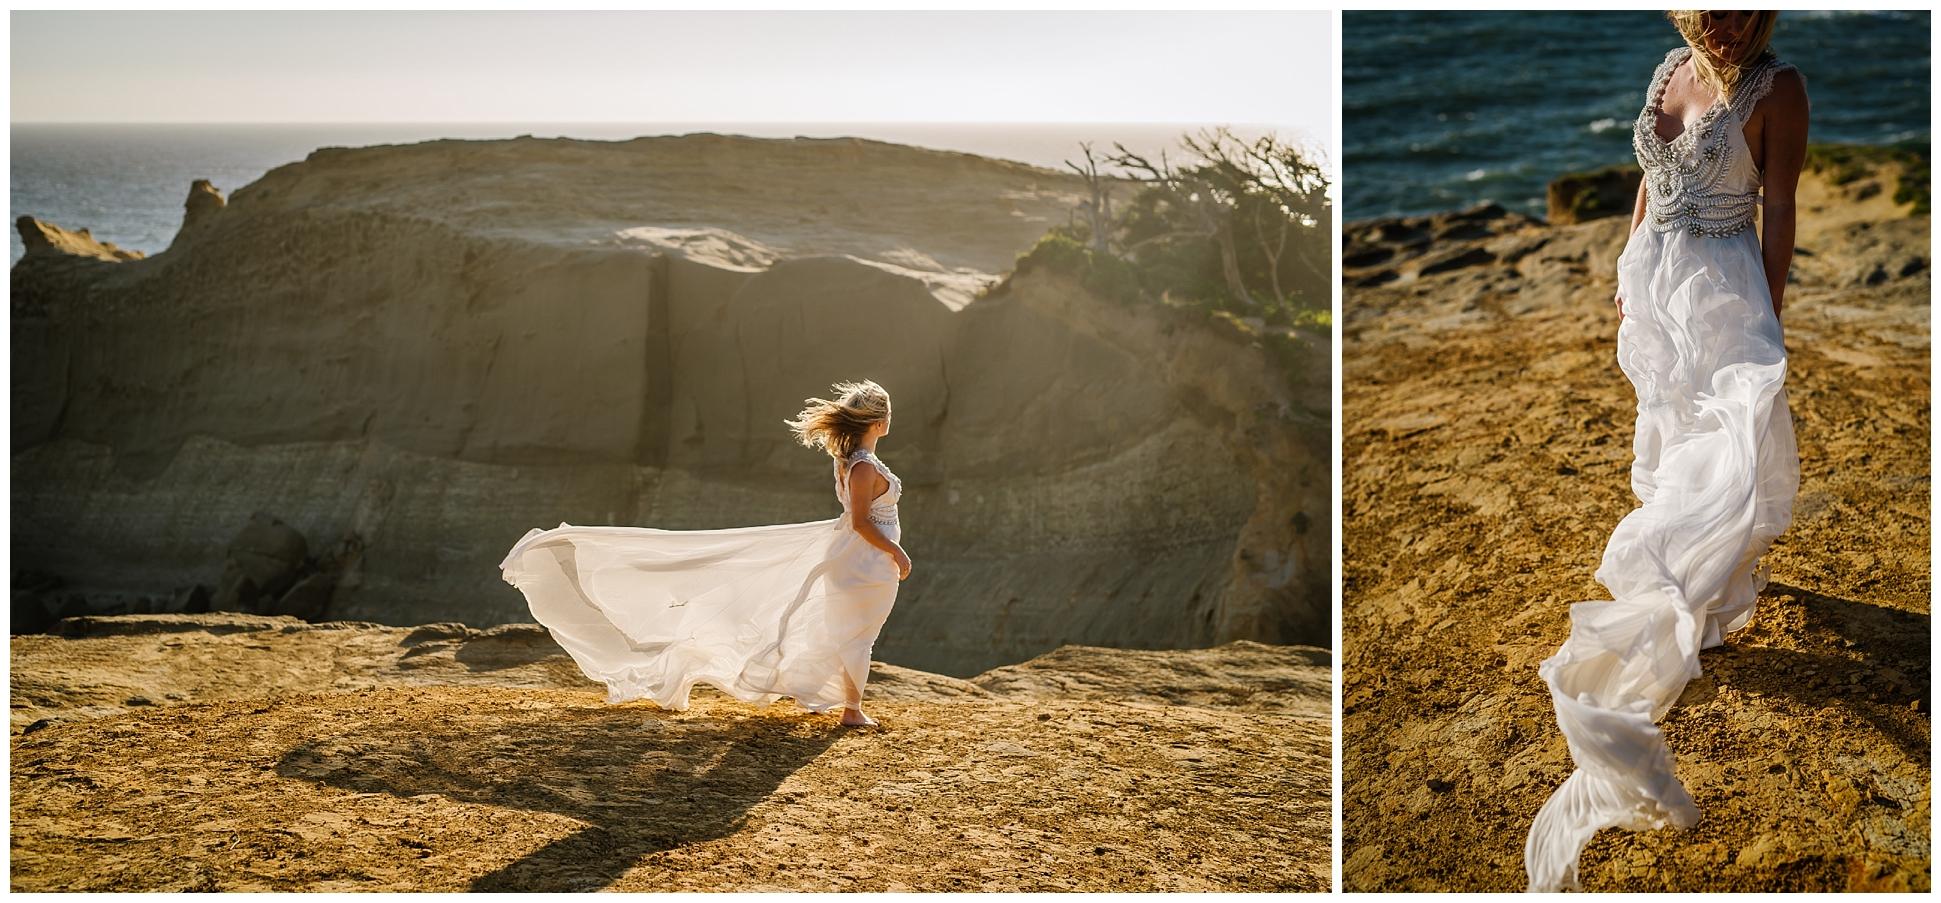 Cape-kiwanda-bridal-portrait-destination-wedding-photographer_0027.jpg